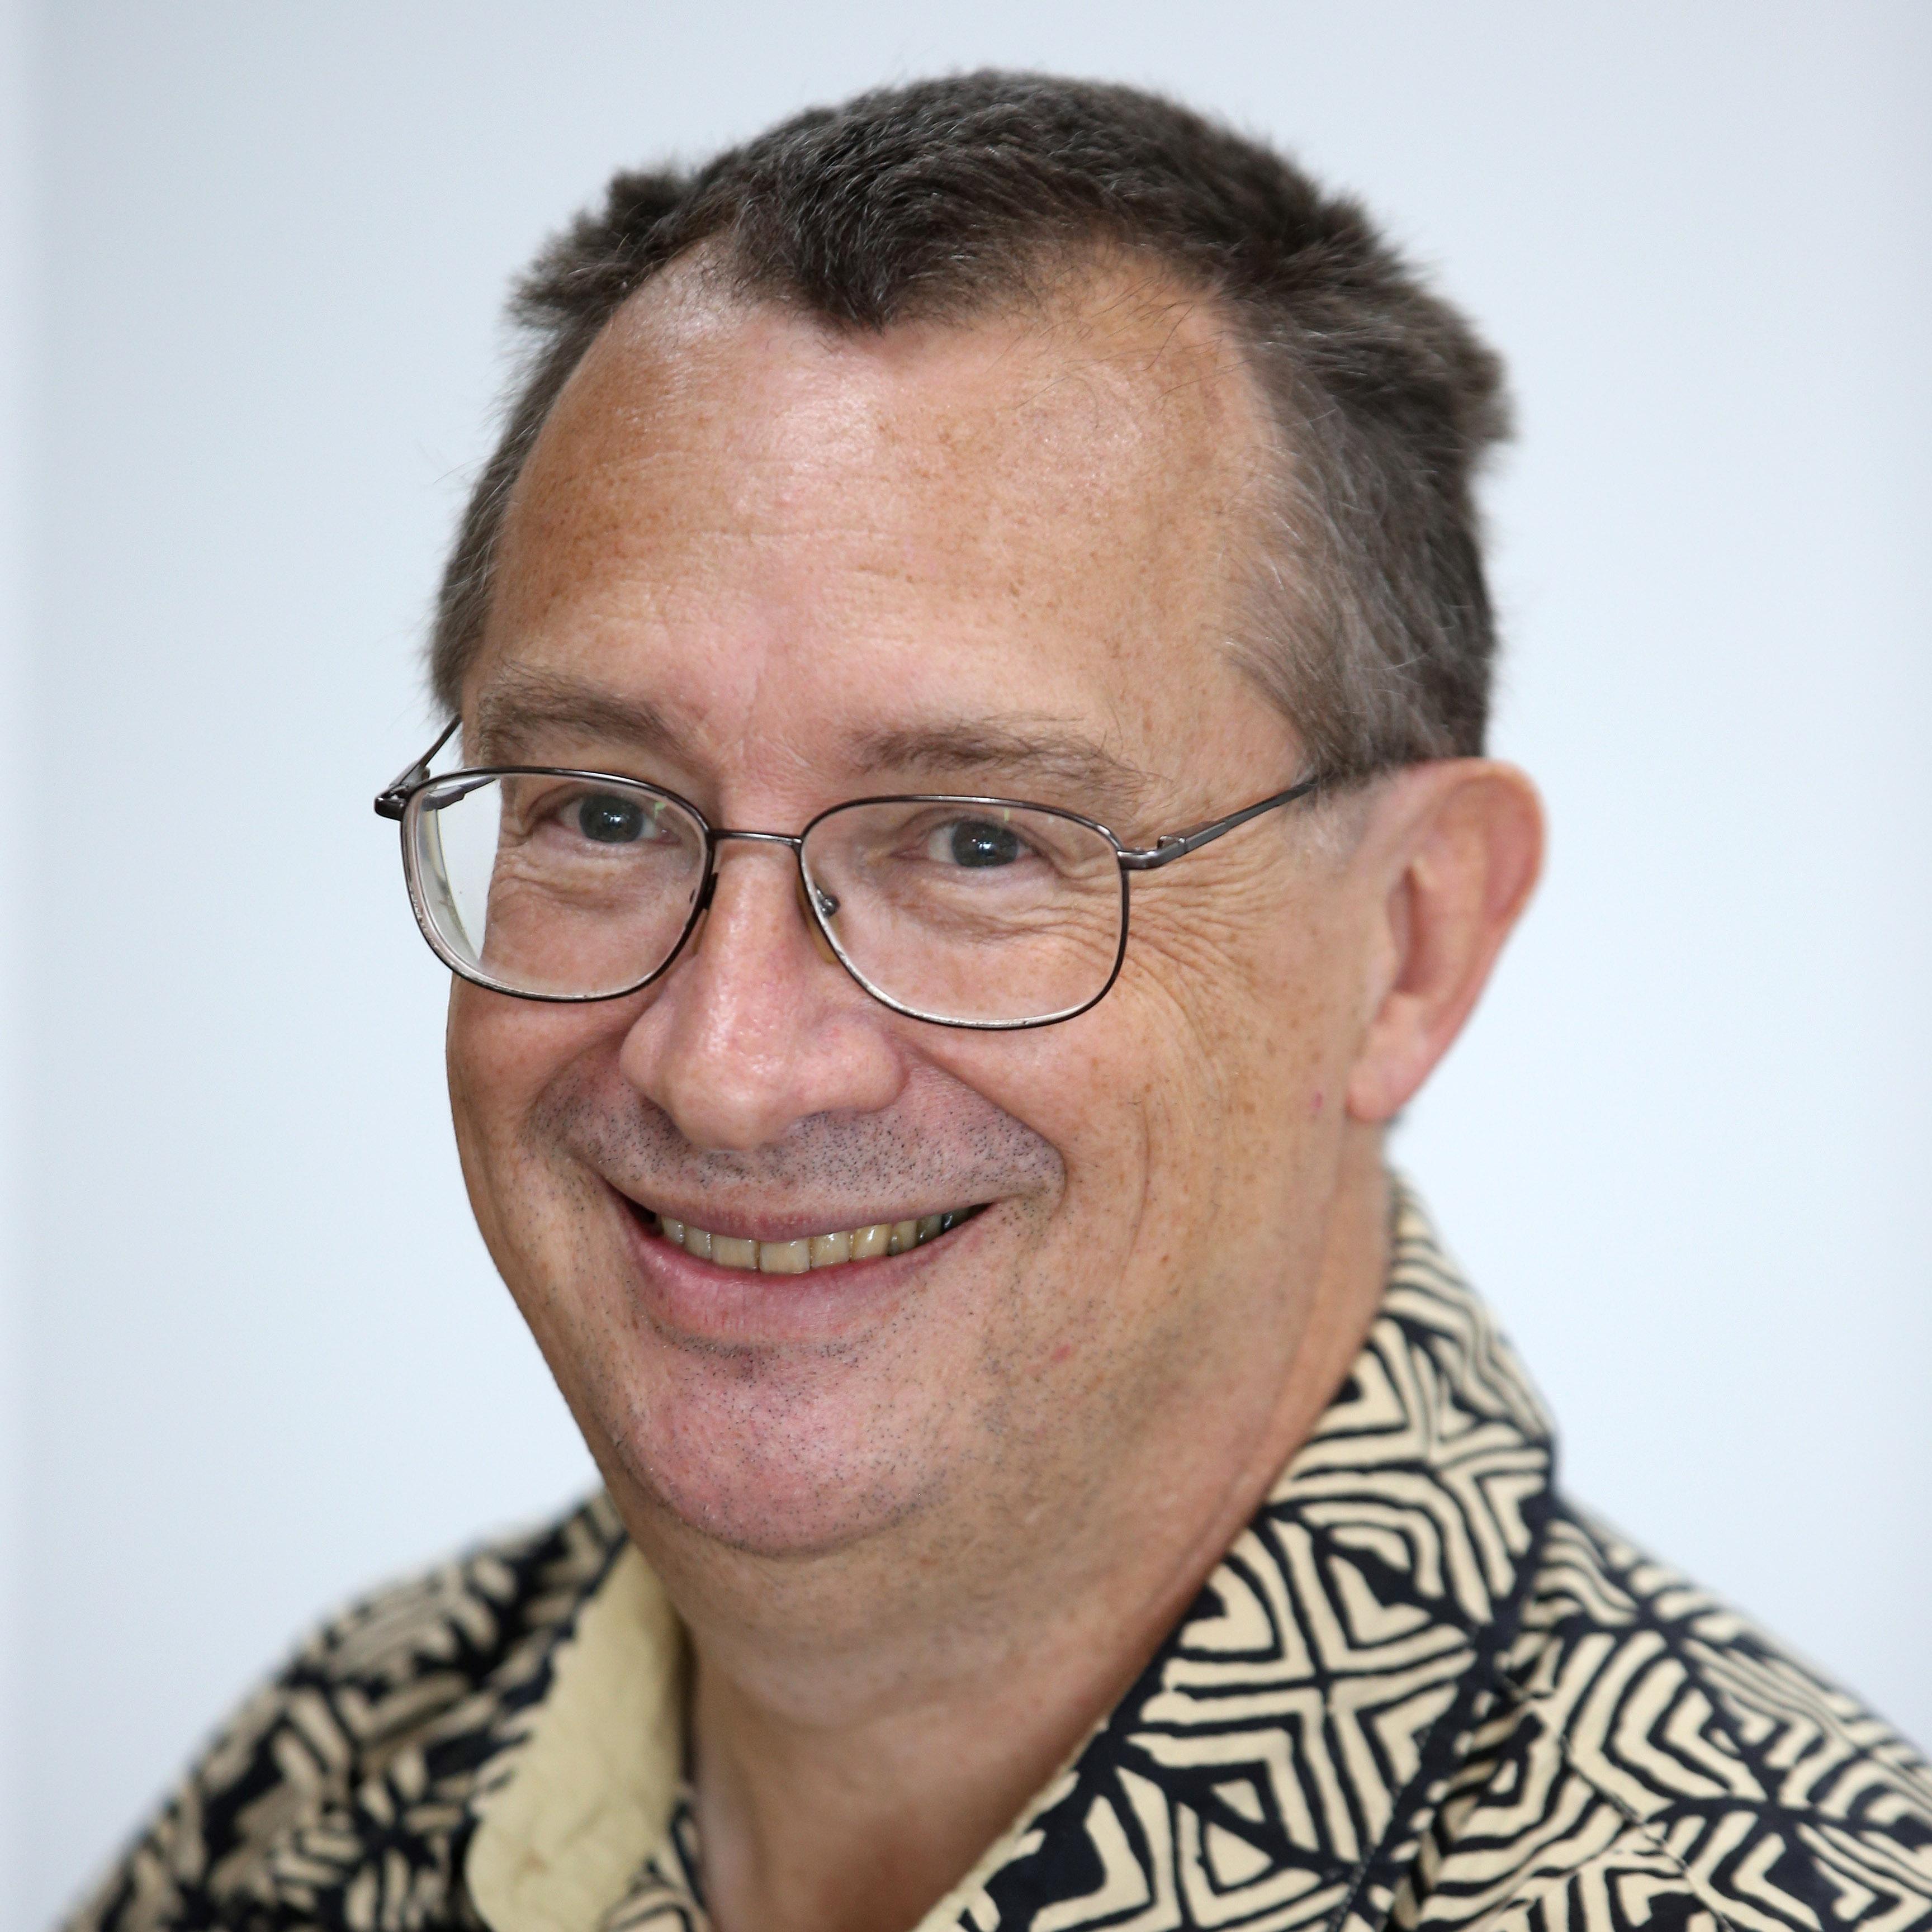 76c279c5d43 Professor Ralph Martin - People - Cardiff University